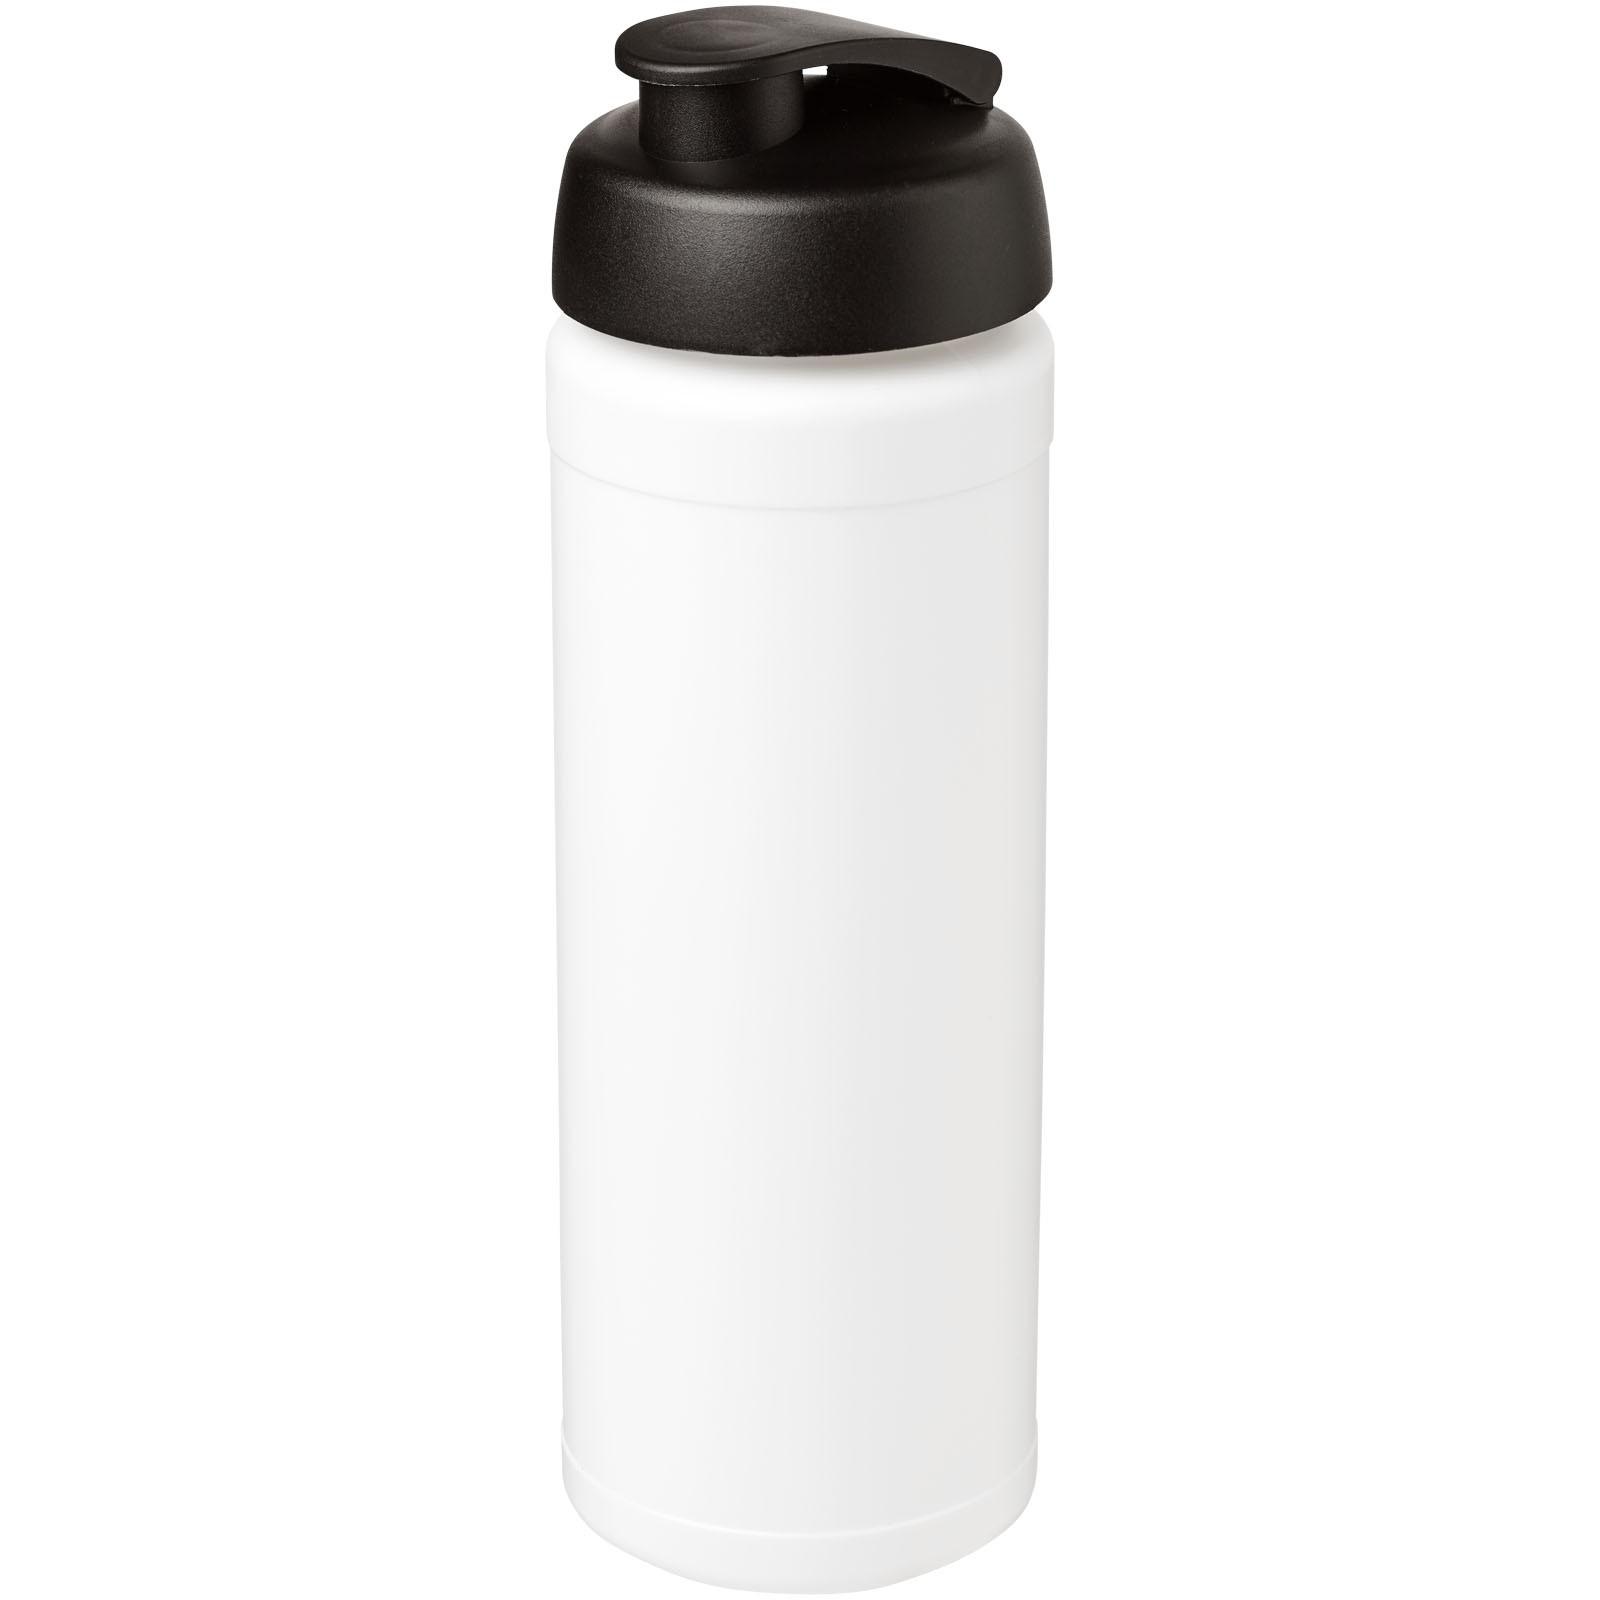 Baseline® Plus grip 750 ml flip lid sport bottle - White / Solid black